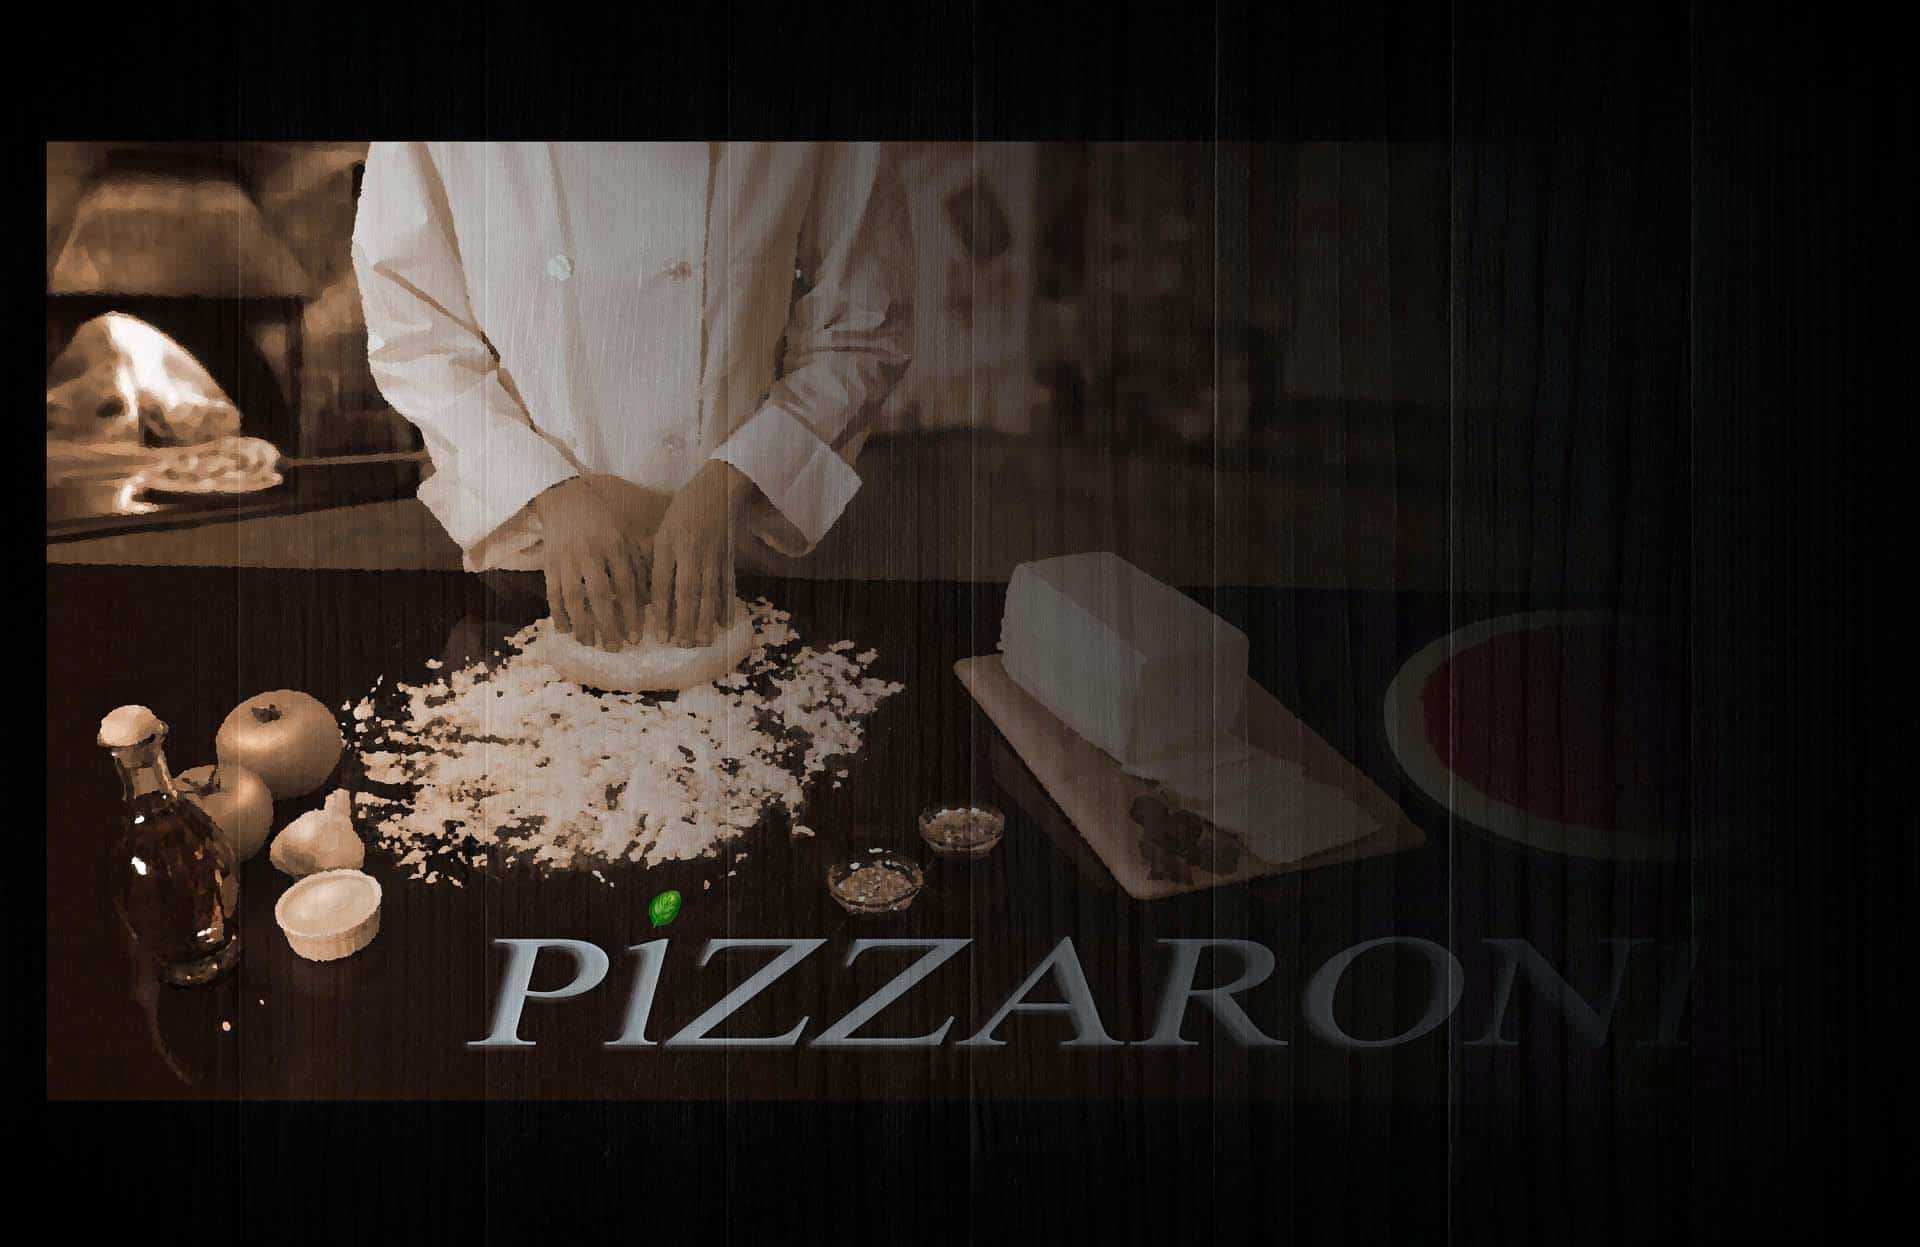 pizzaroni mural